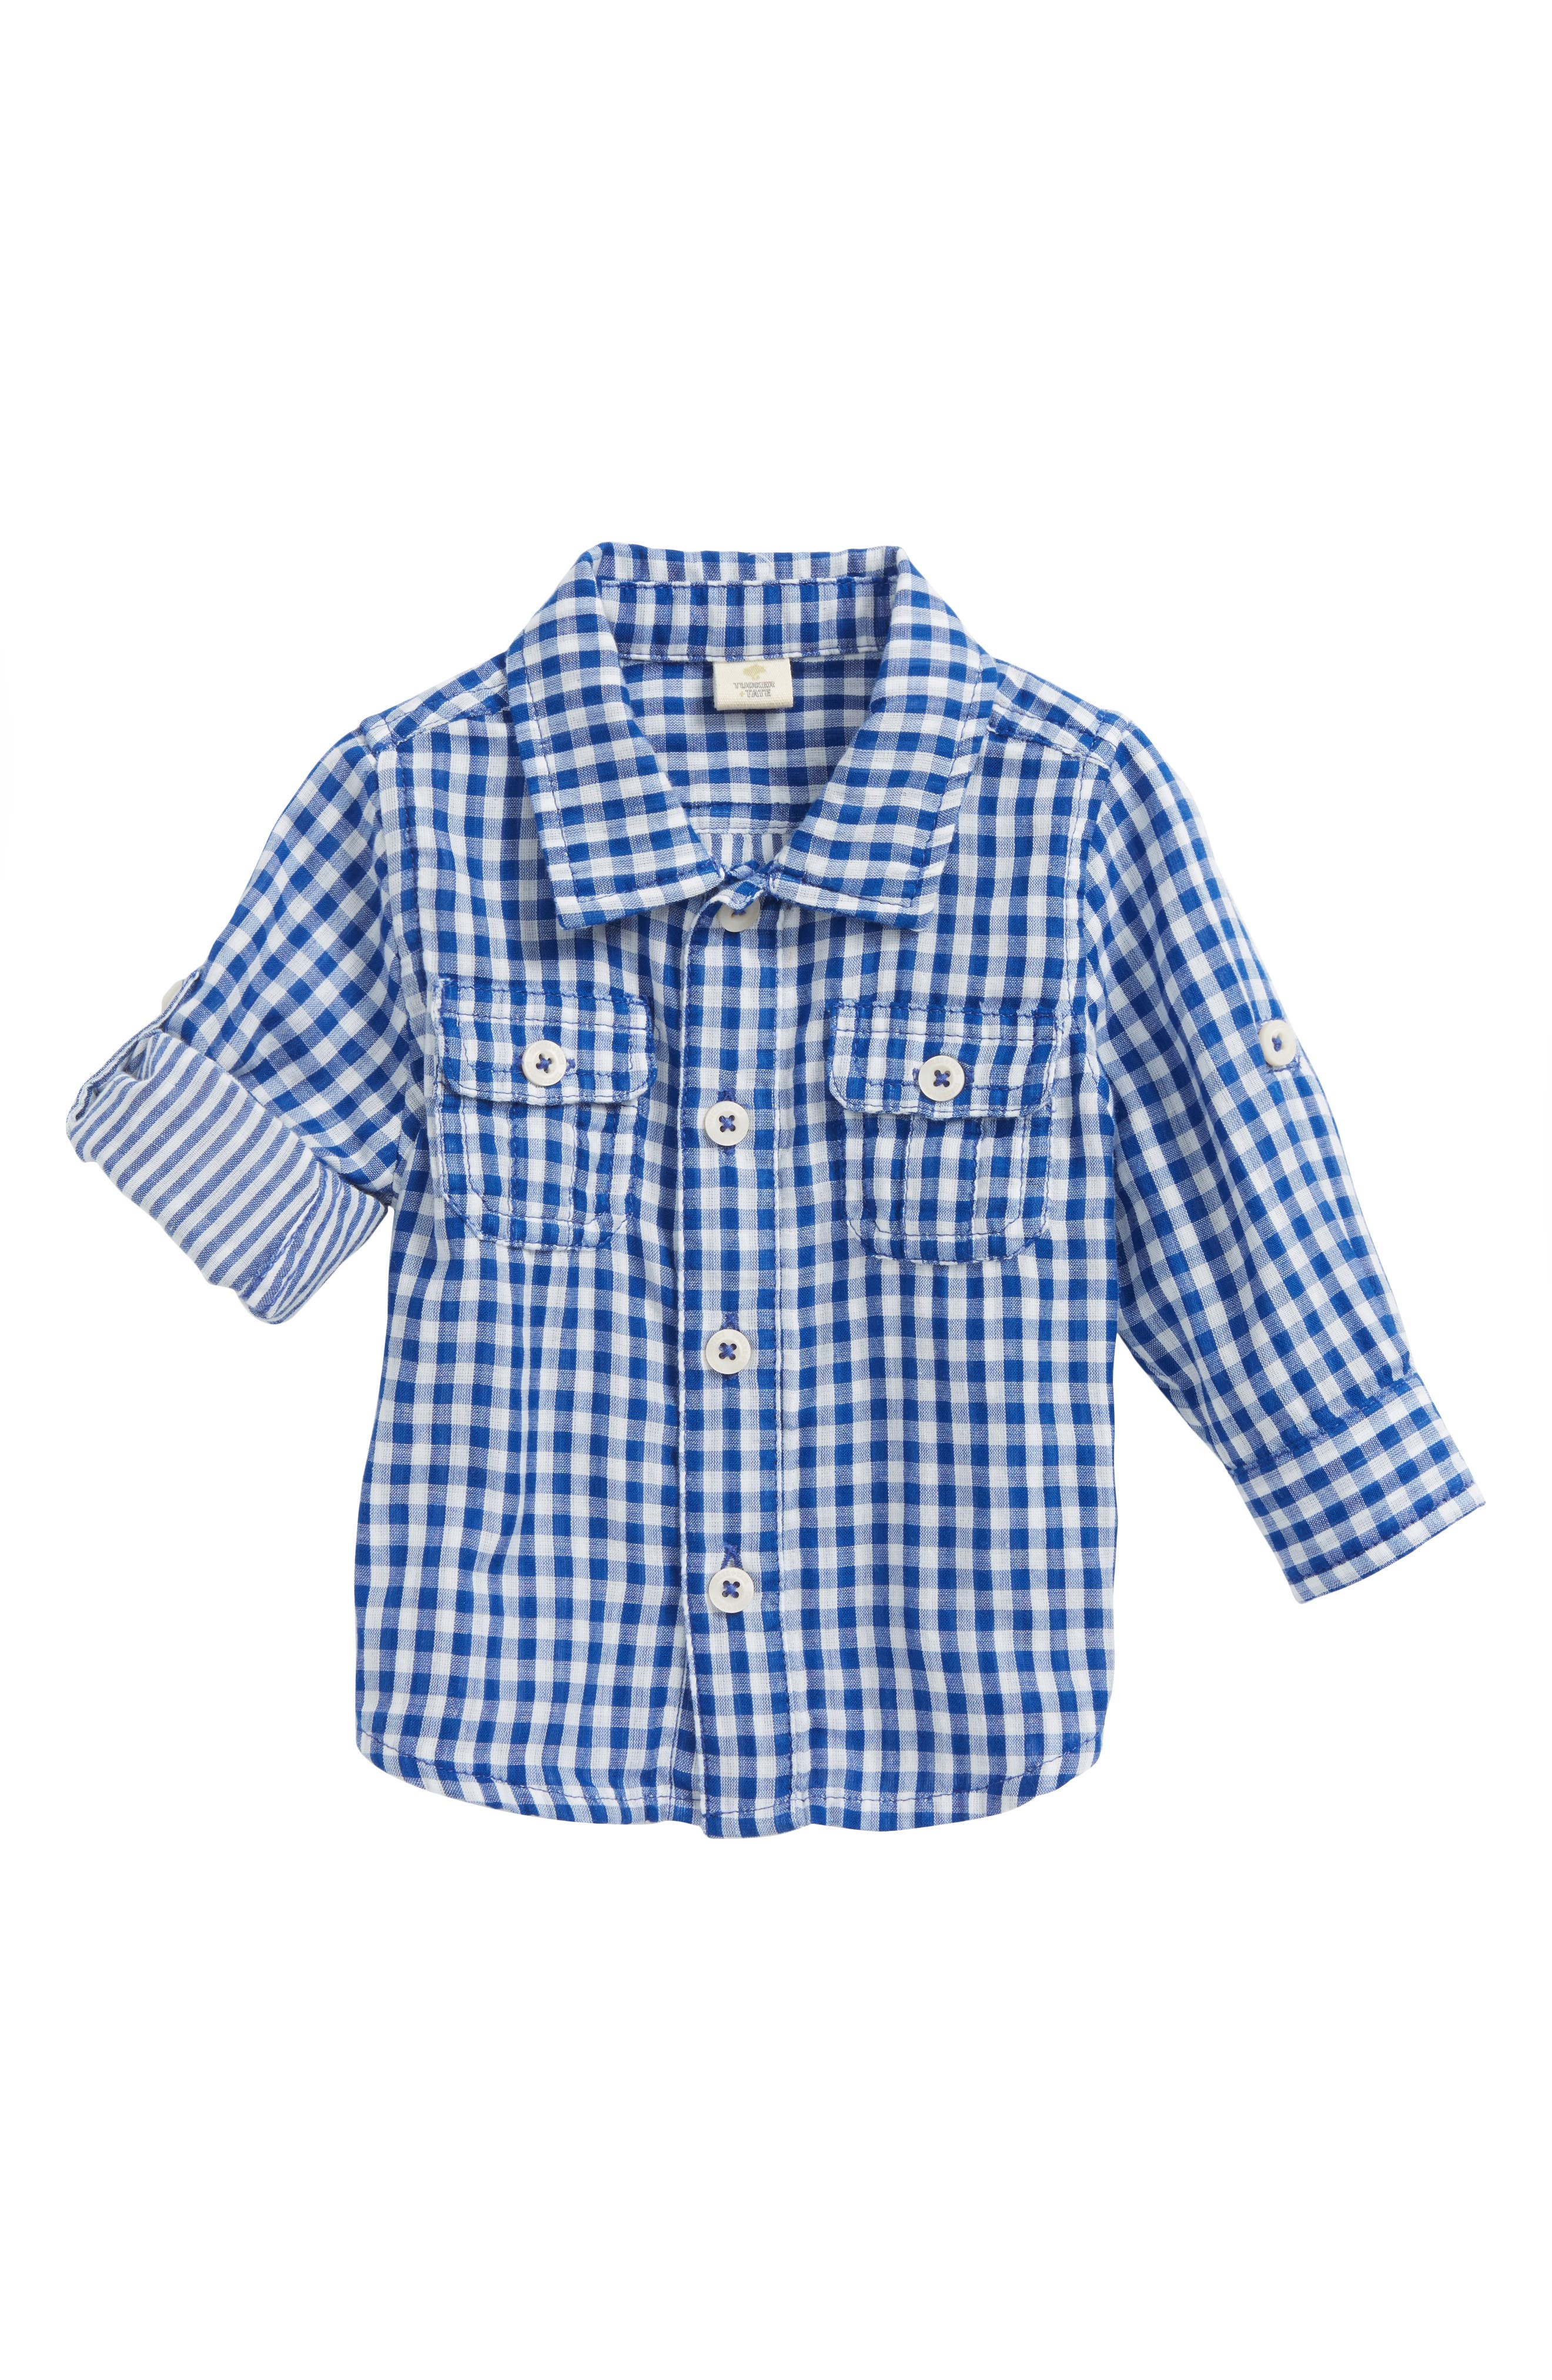 Double Woven Shirt,                             Main thumbnail 1, color,                             Blue Calm Gingham